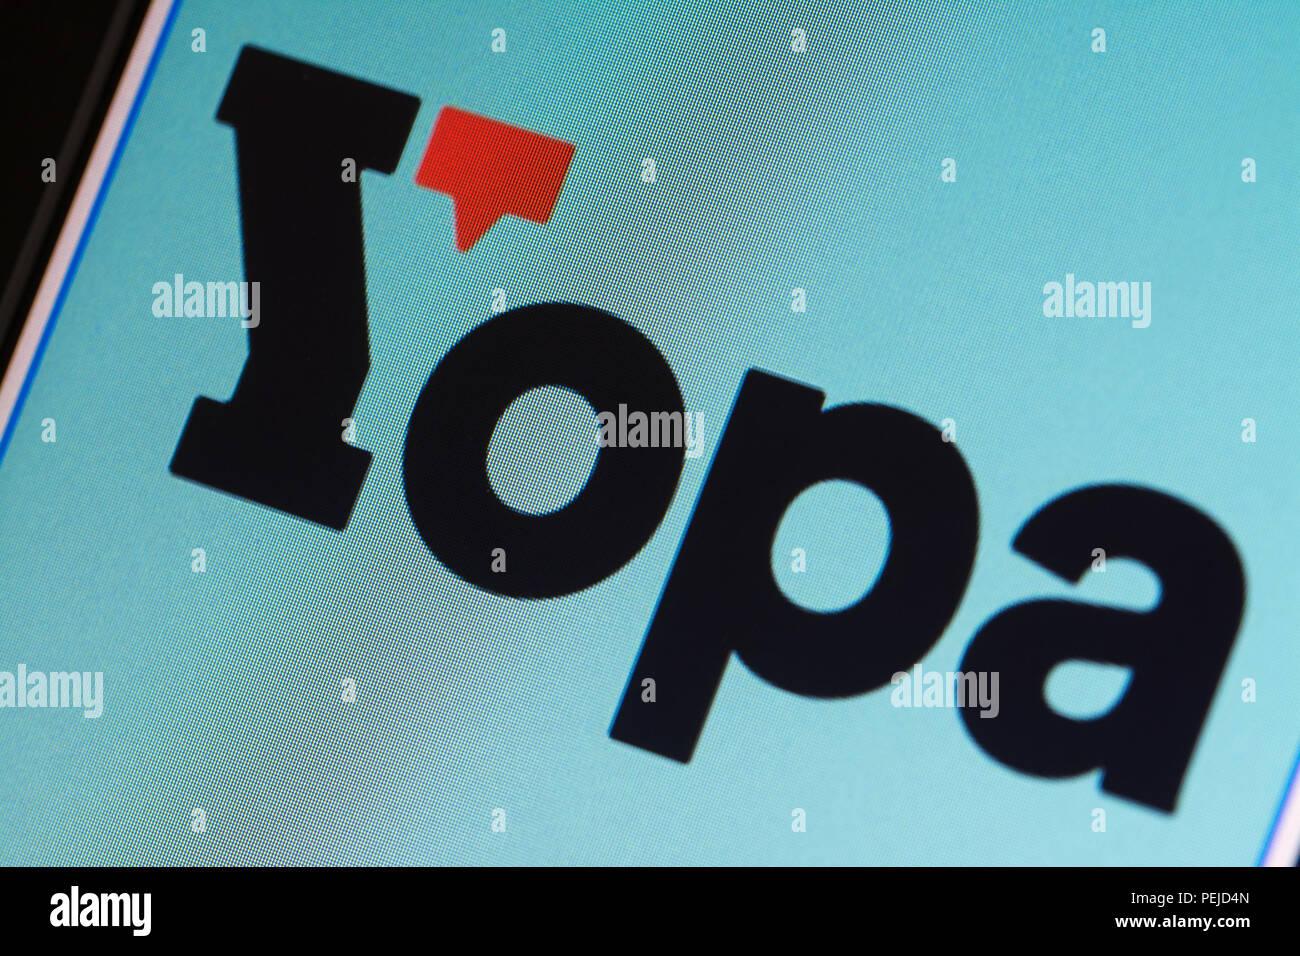 Yopa online estate agents website and logo - computer screenshot - Stock Image